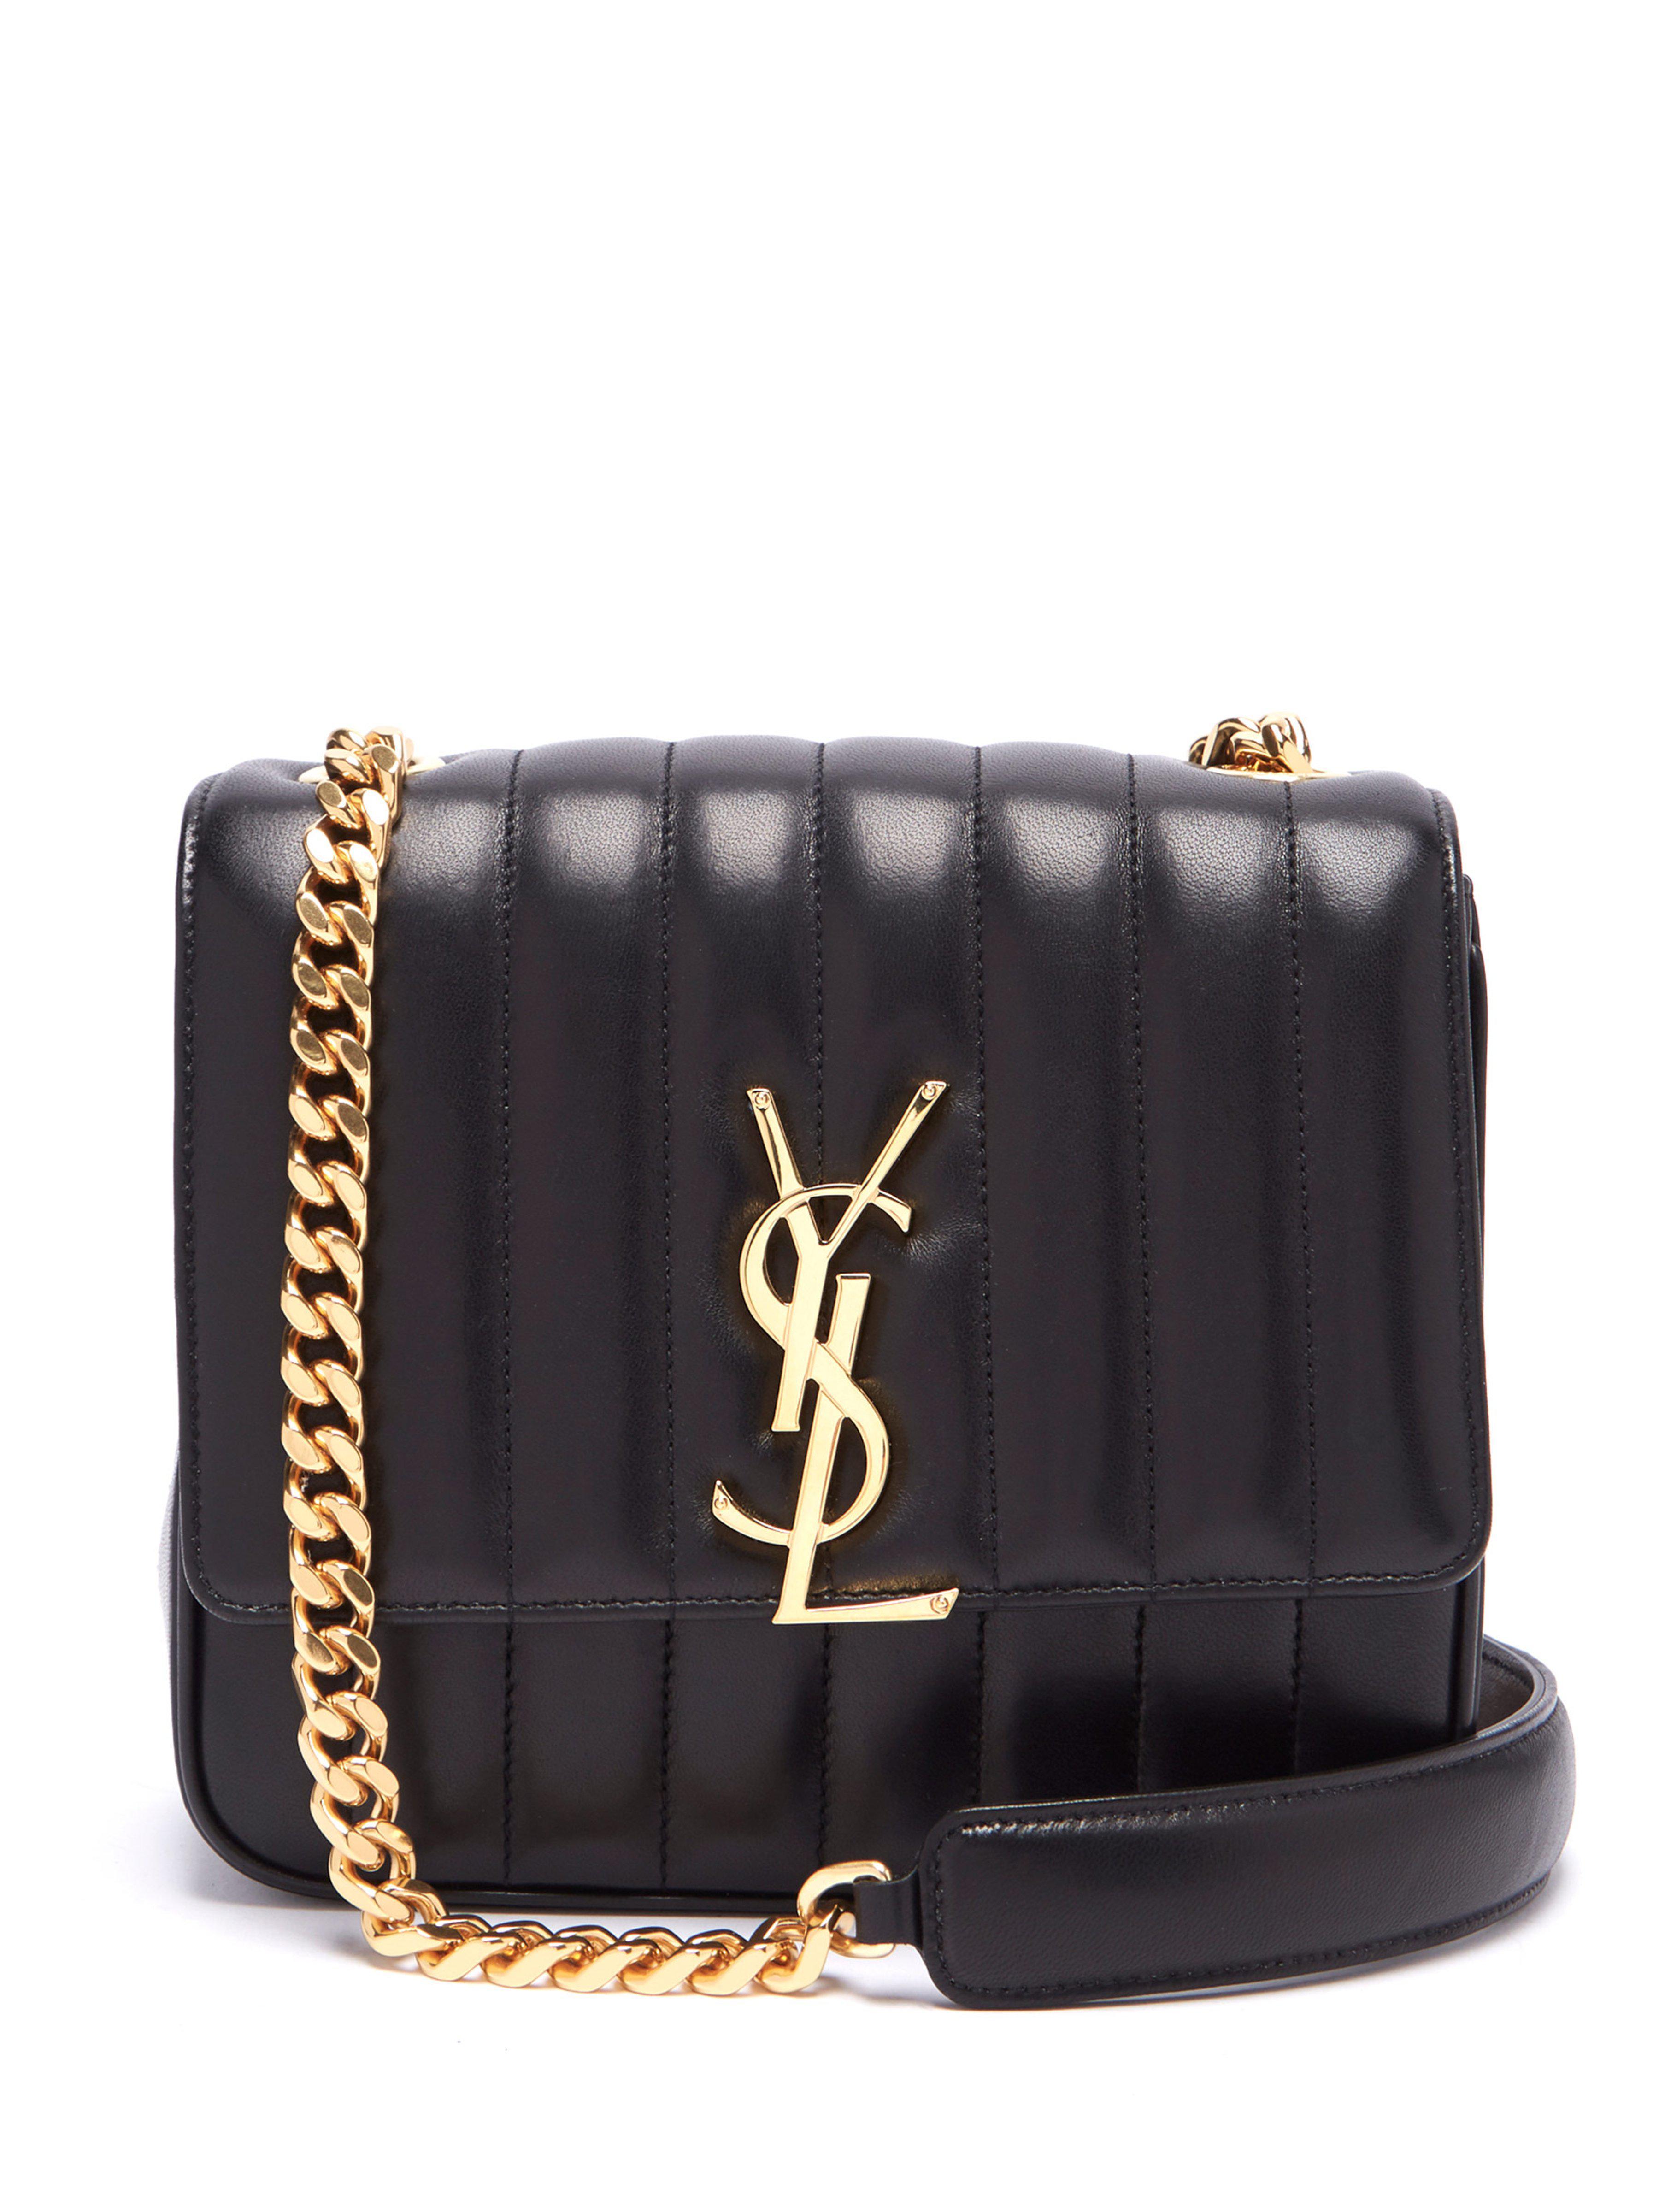 Saint Laurent Large Vicky Leather Crossbody Bag in Black - Save ... c02857ff371